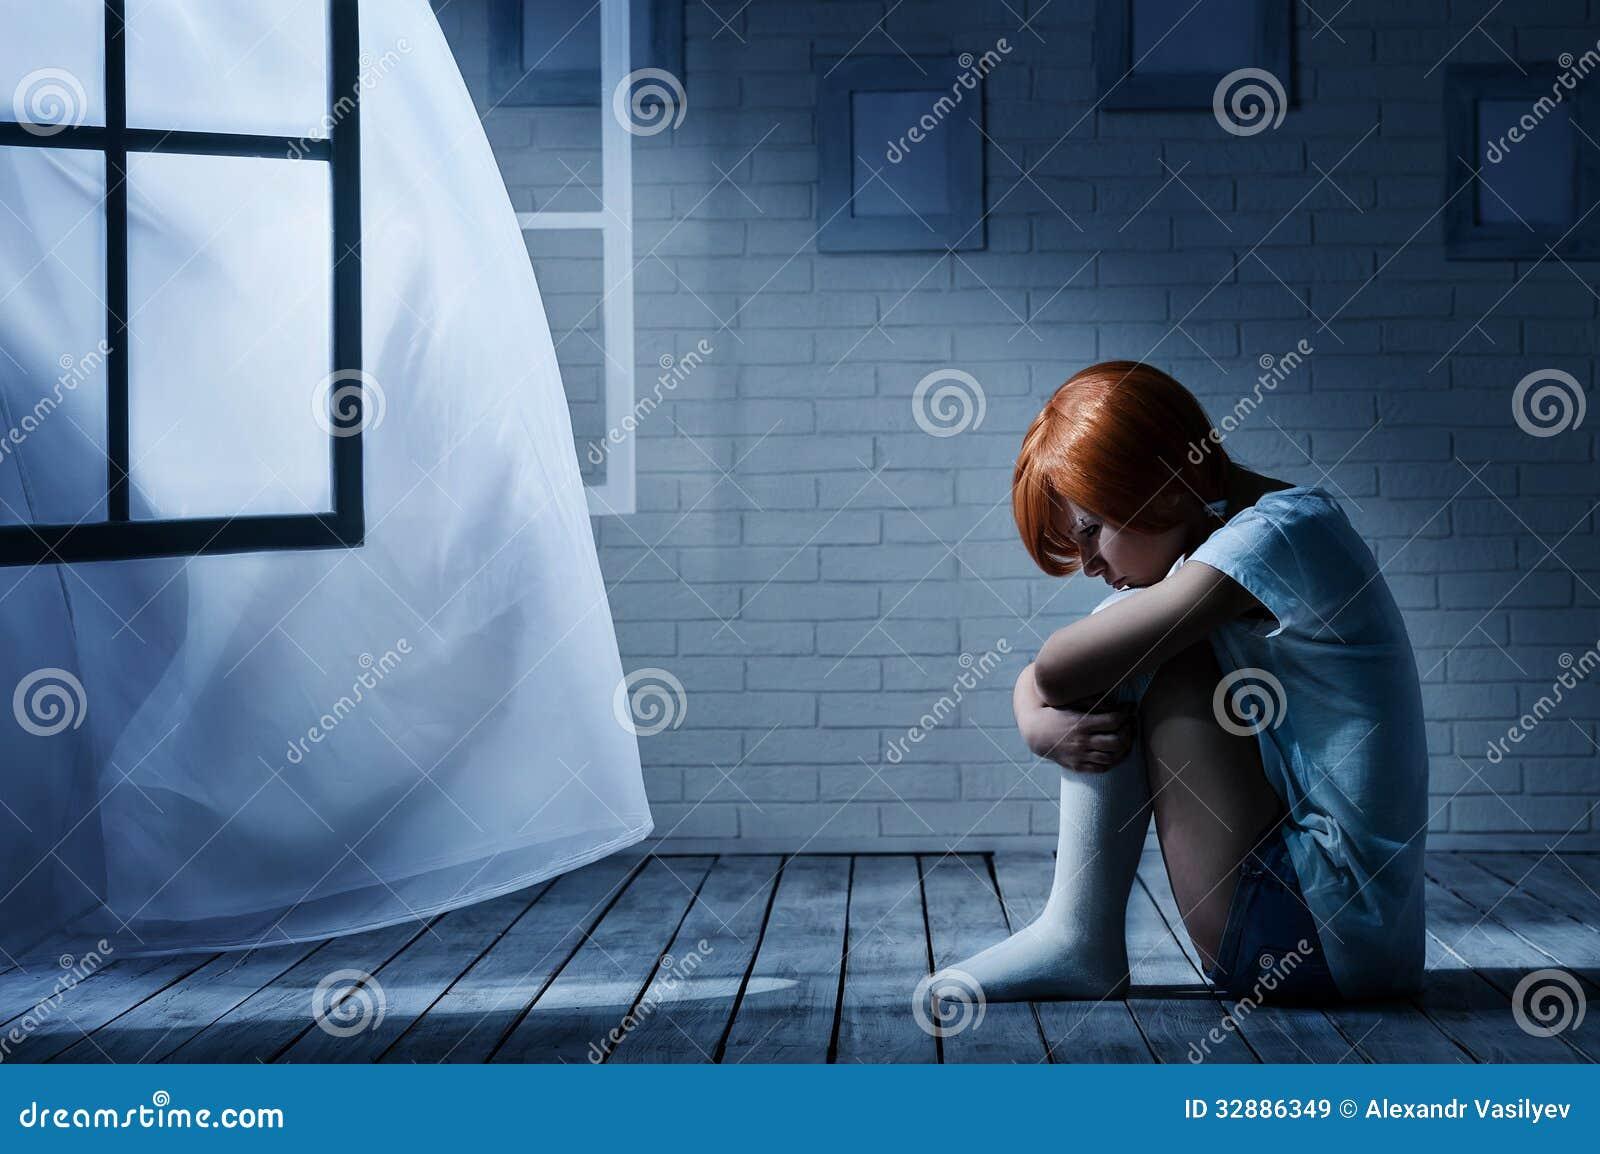 Девушка в пустой комнате фото